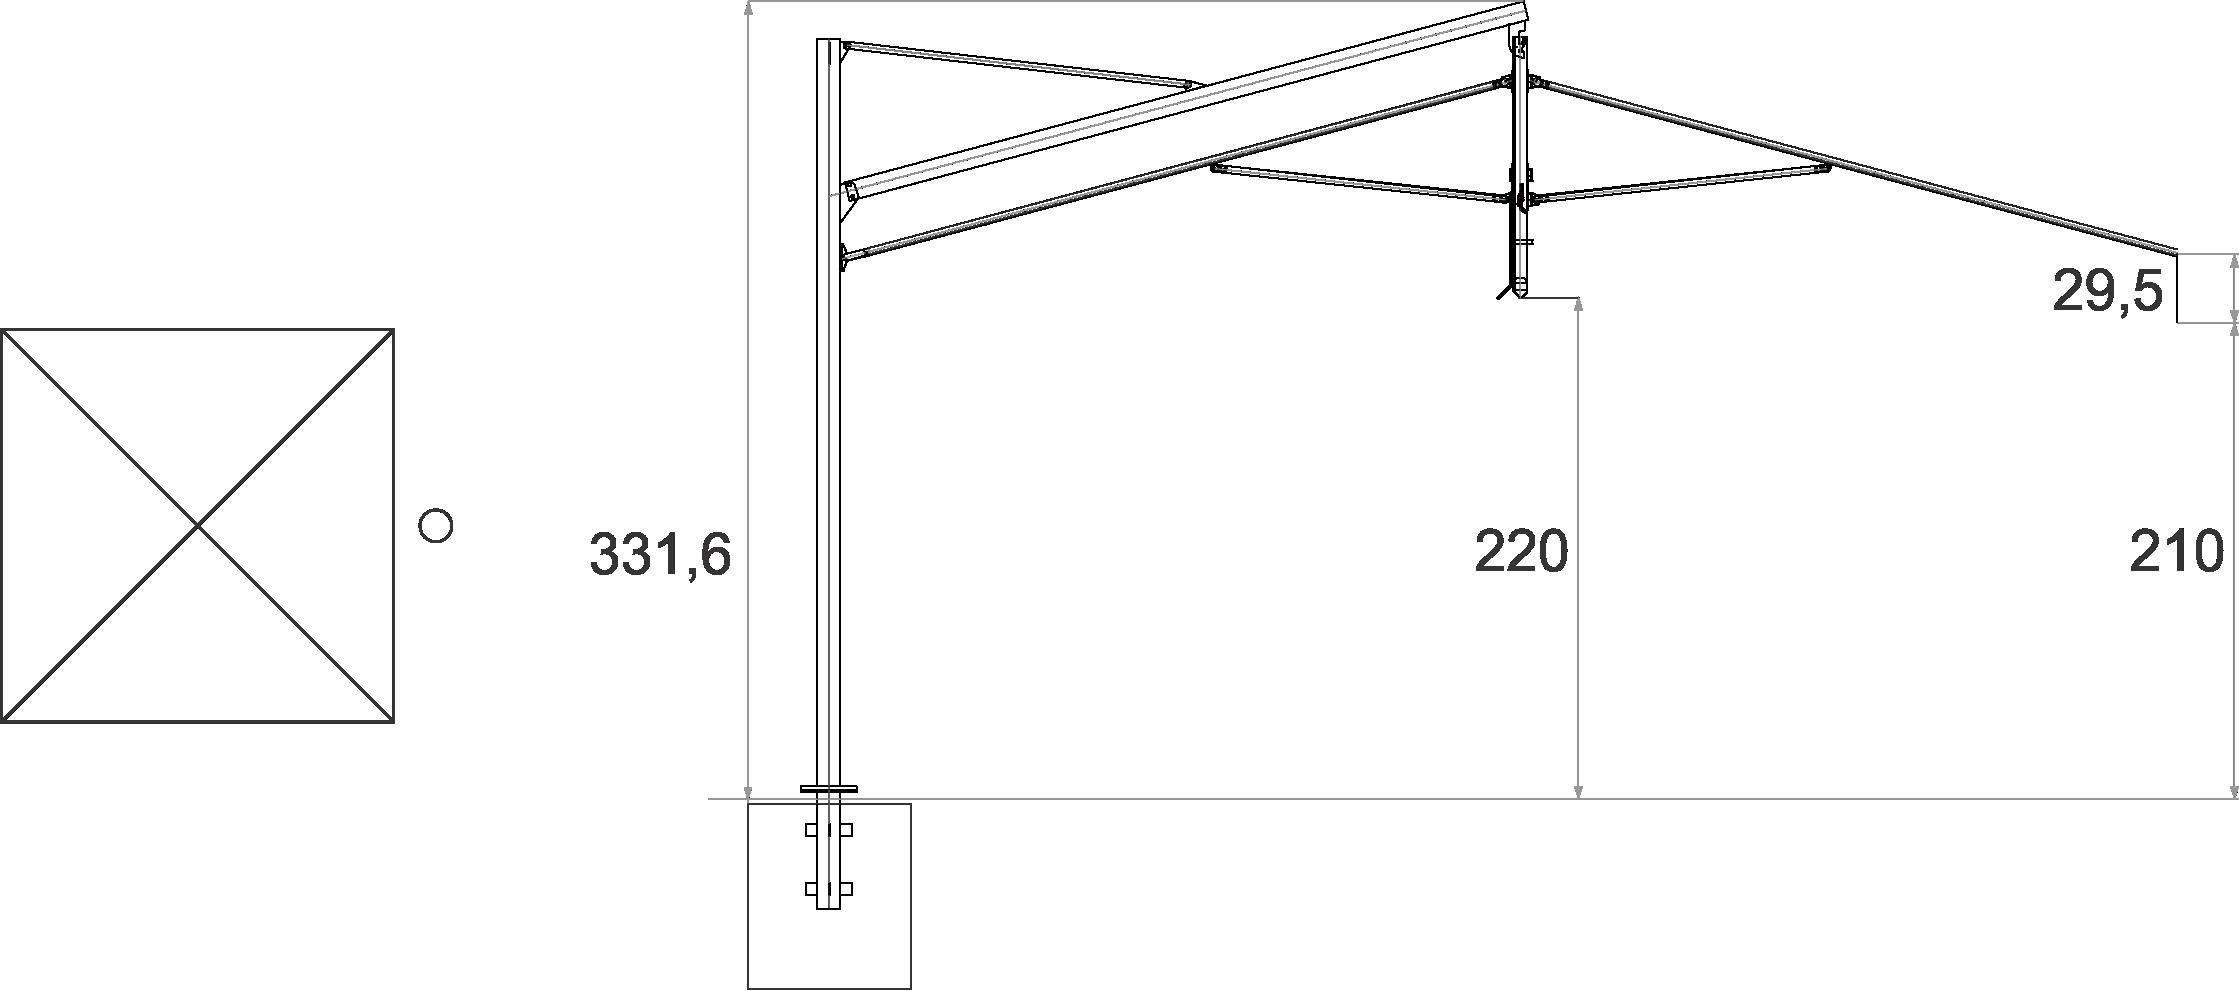 1557423868-console-oznaka-visina-tabela-za-dimenzije.png